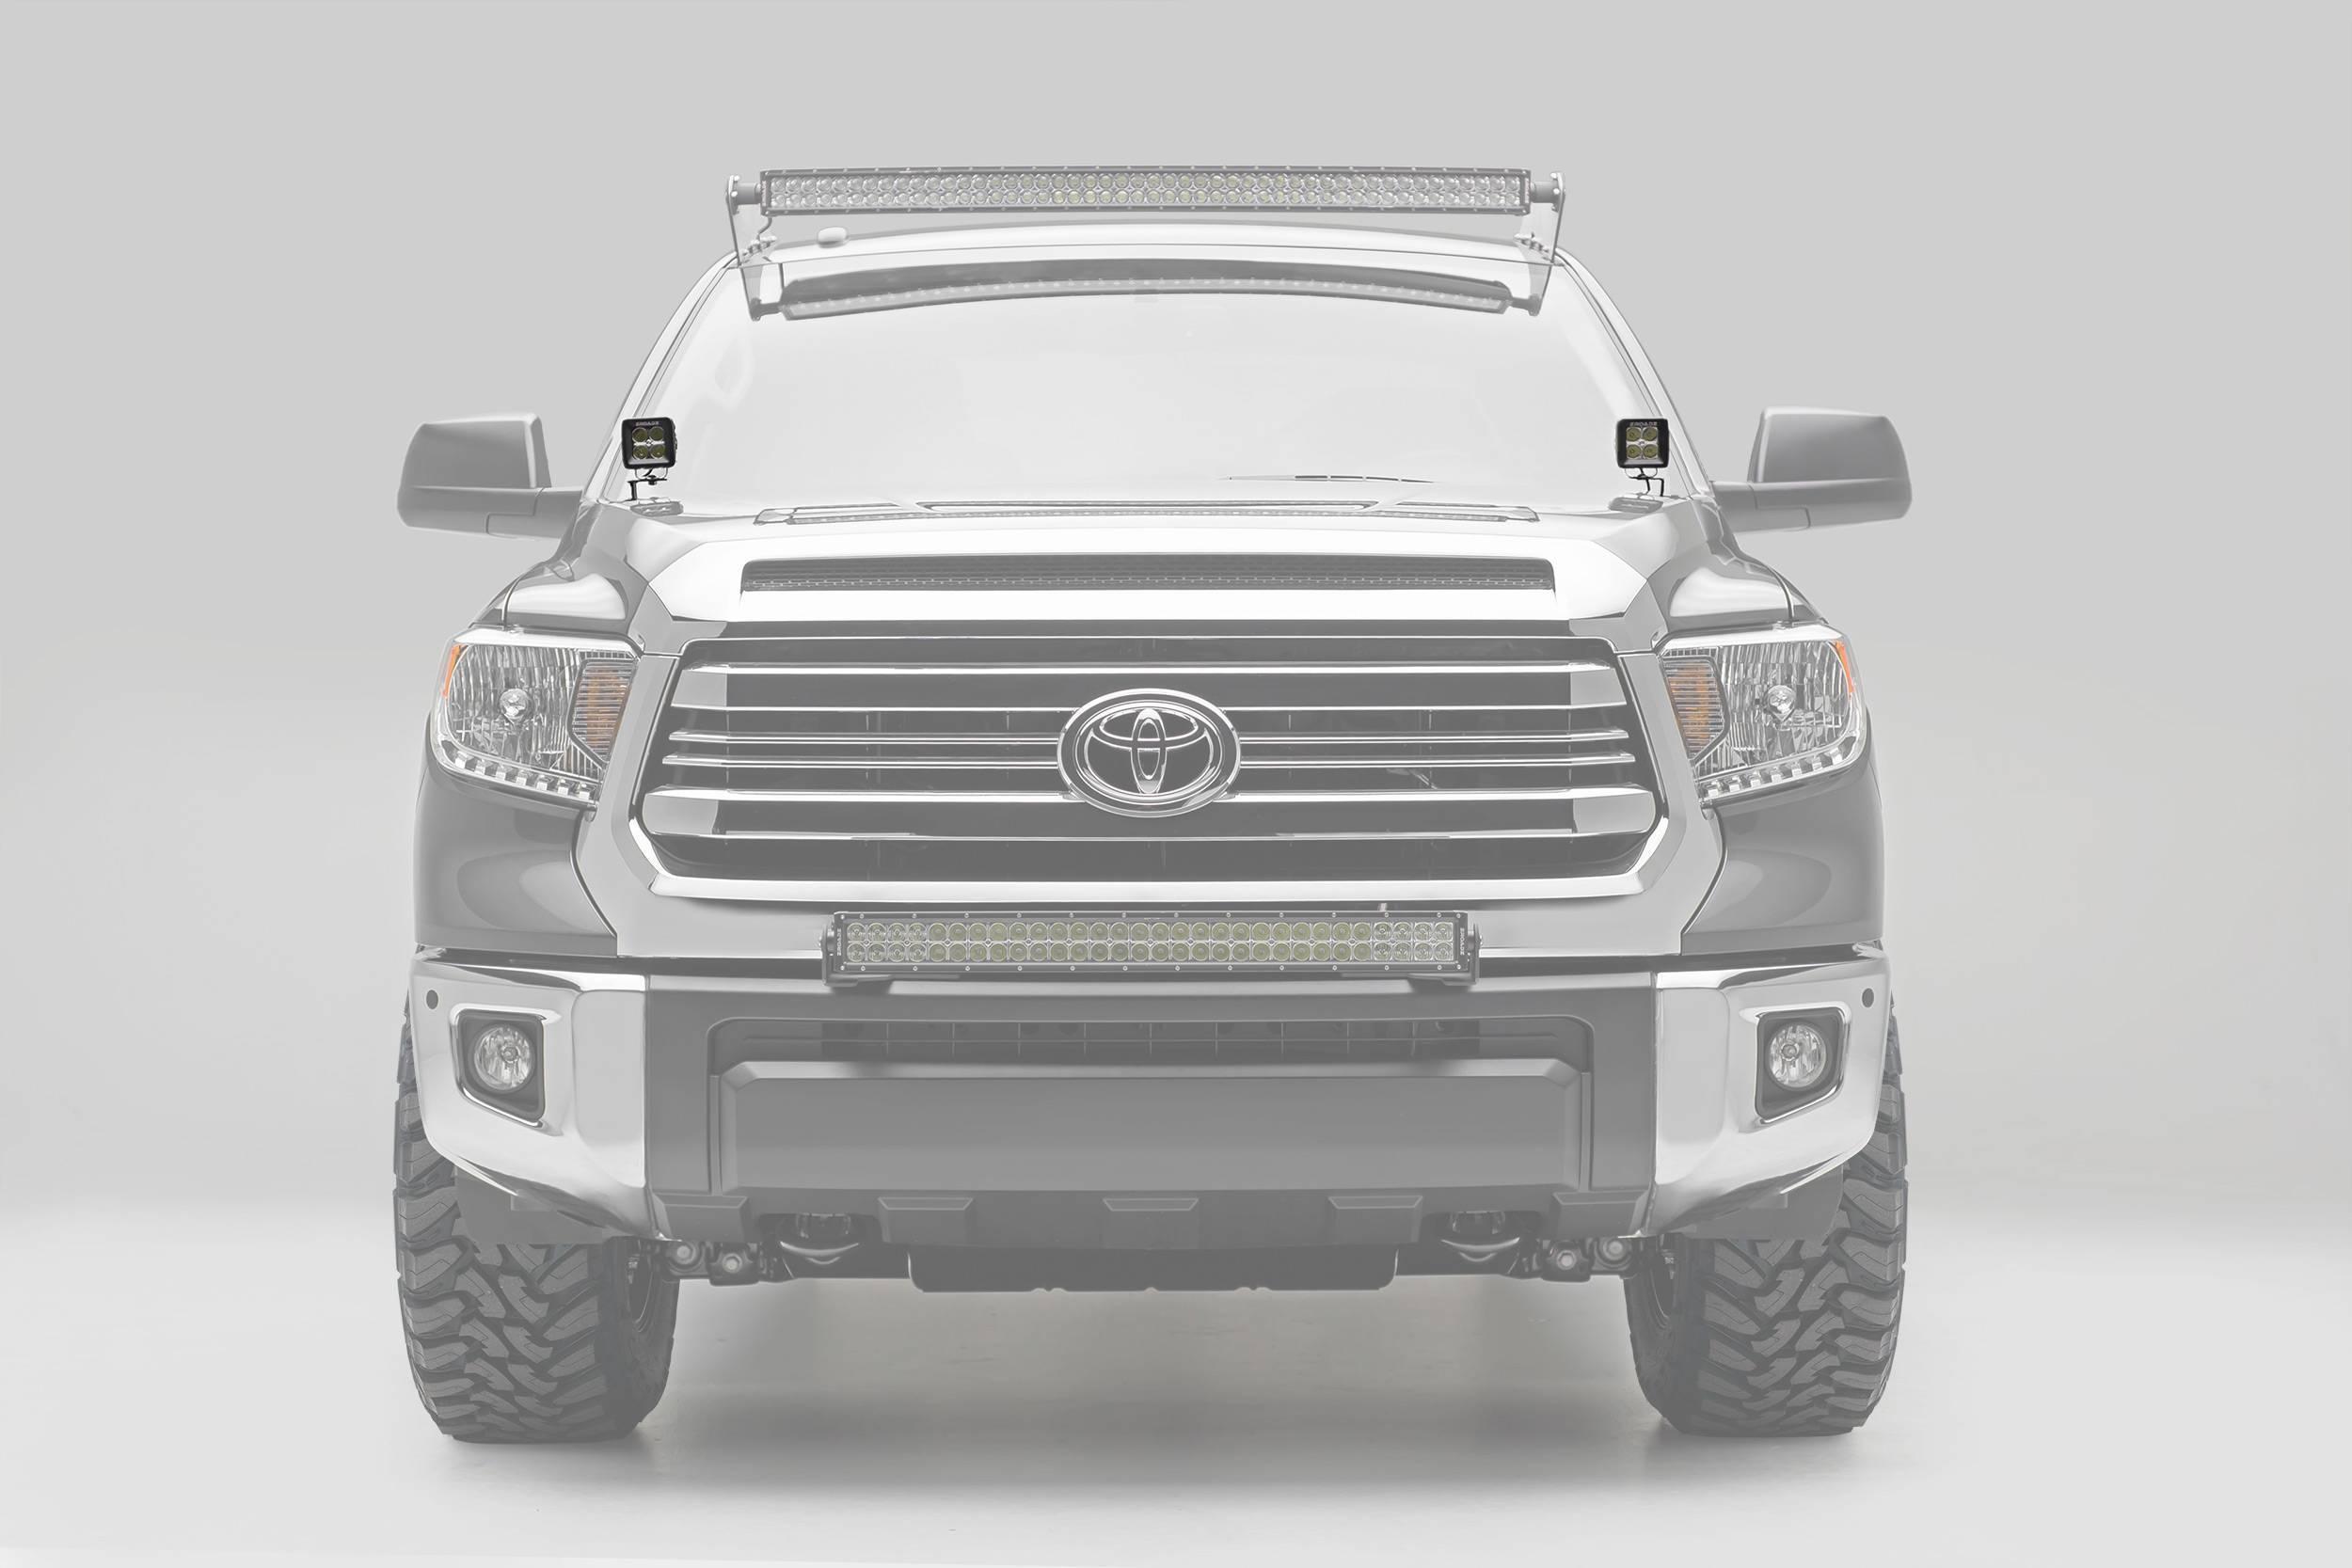 ZROADZ - 2014-2021 Toyota Tundra Hood Hinge LED Kit with (2) 3 Inch LED Pod Lights - PN #Z369641-KIT2